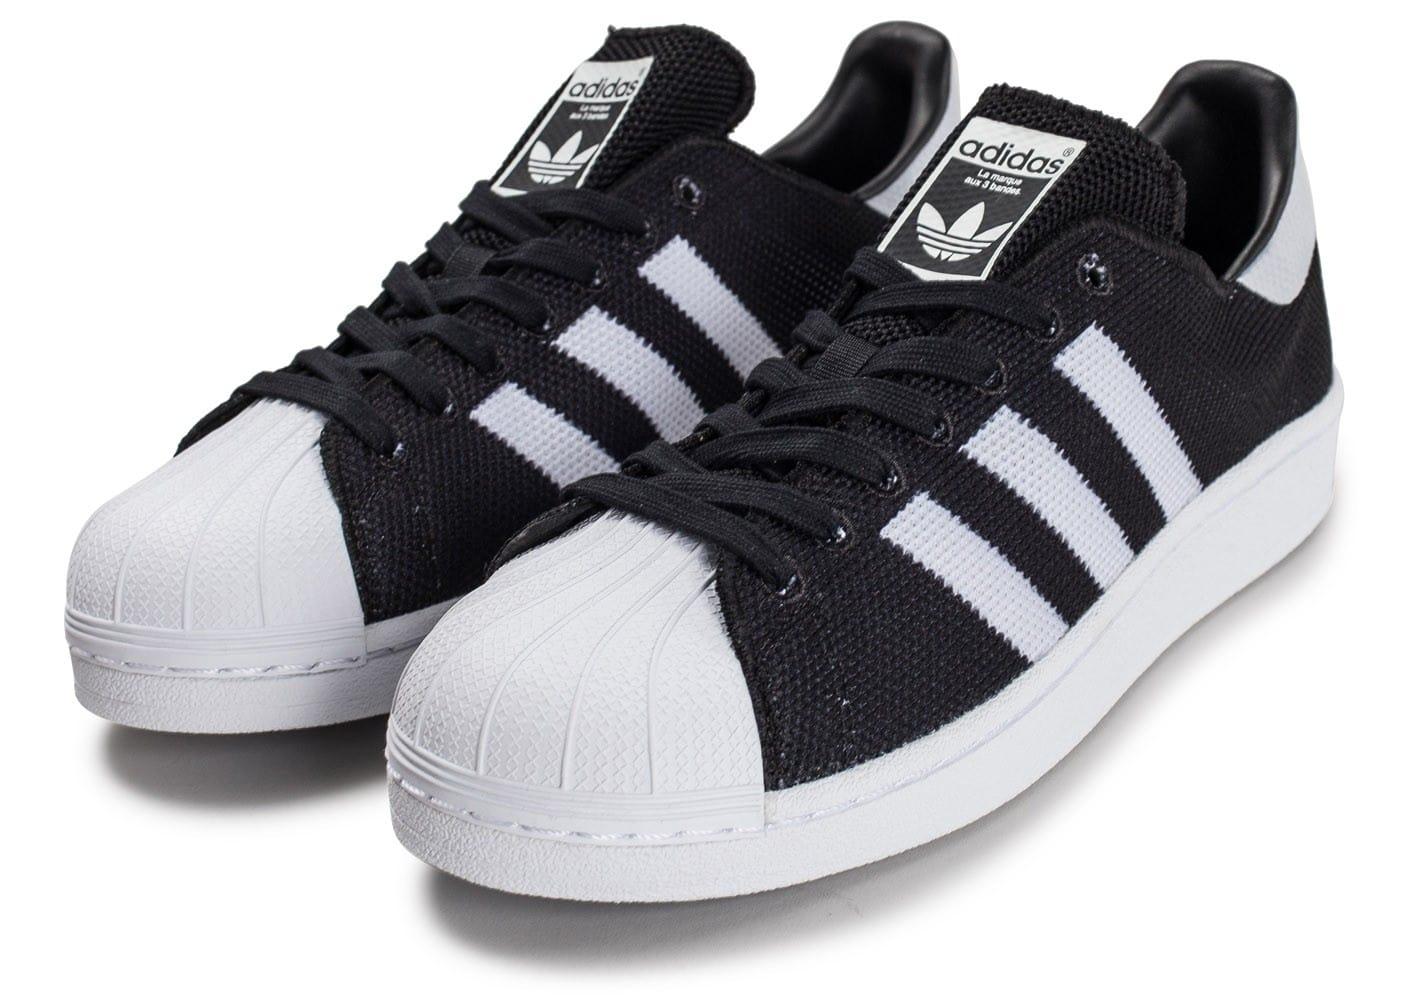 Baskets Adidas Superstar mesh noire - du 43,5 au 46